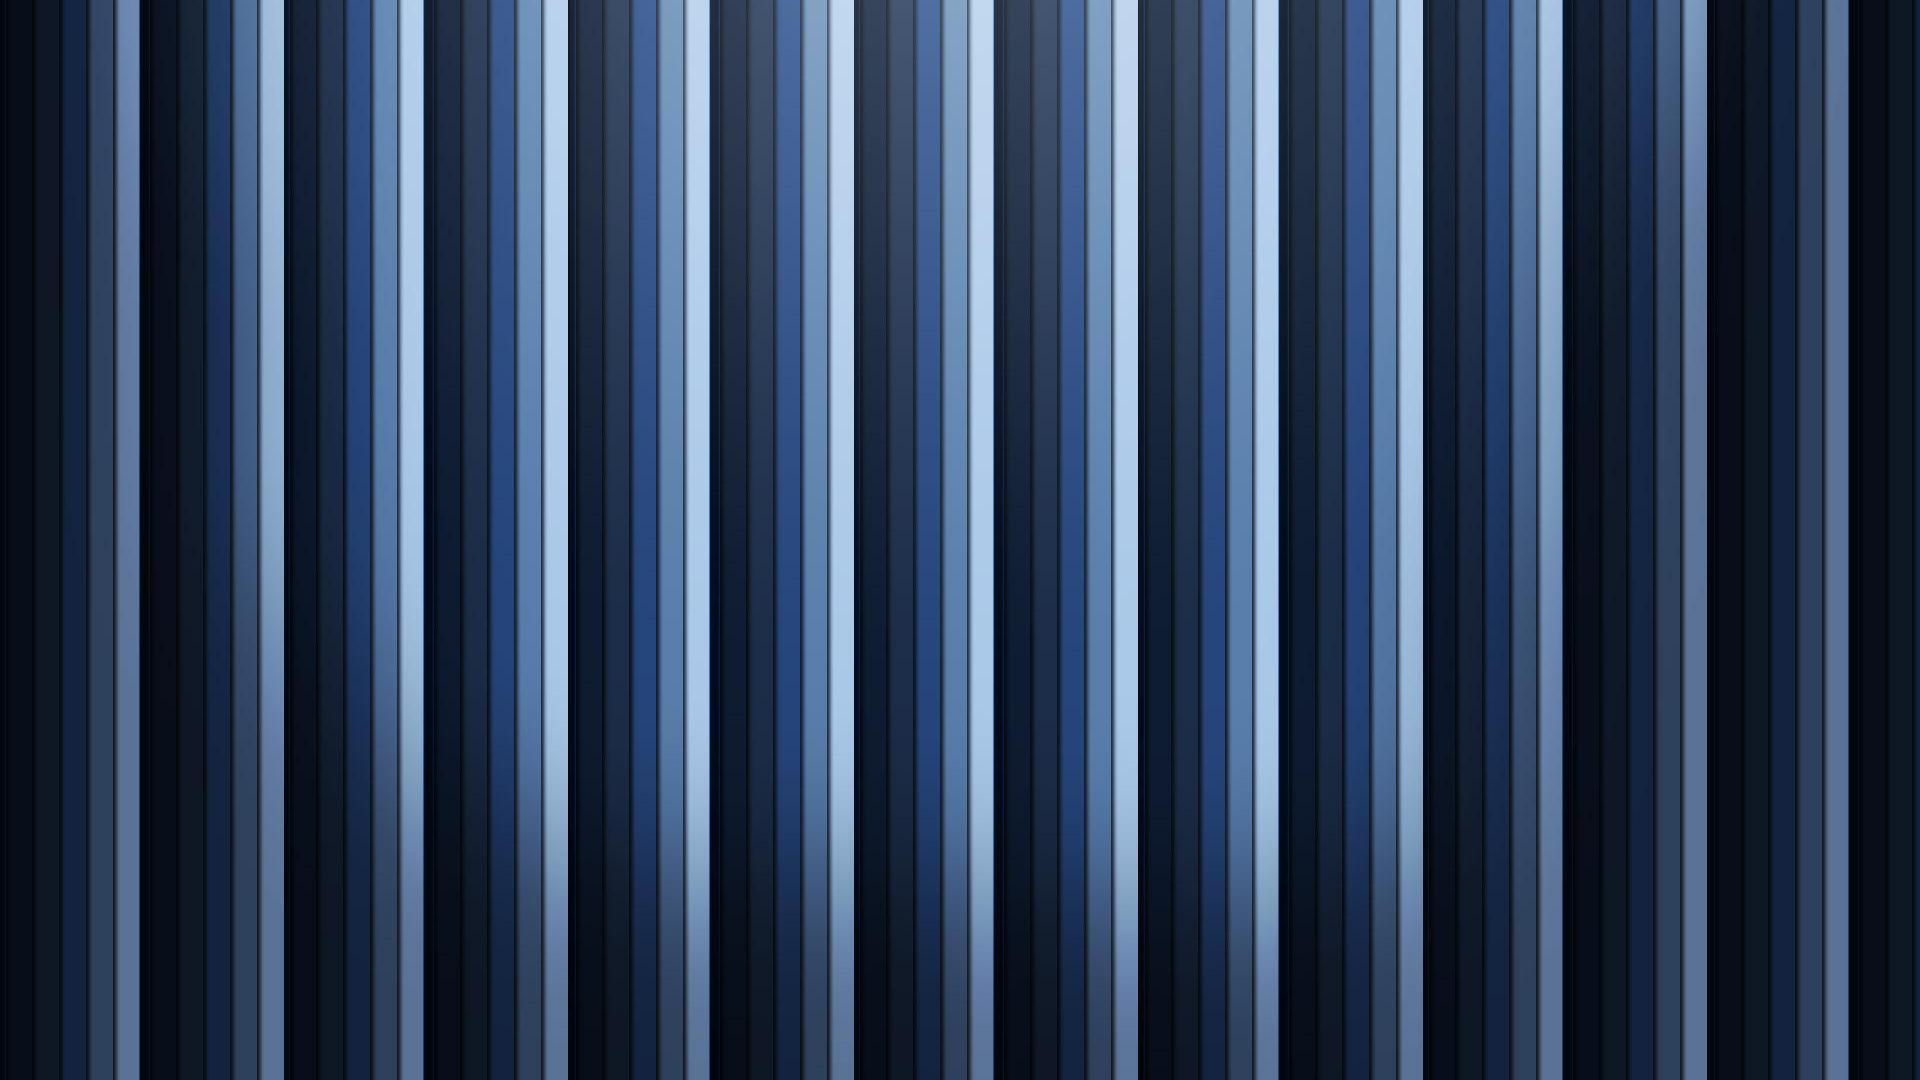 48+ Black and White Stripes Wallpaper on WallpaperSafari